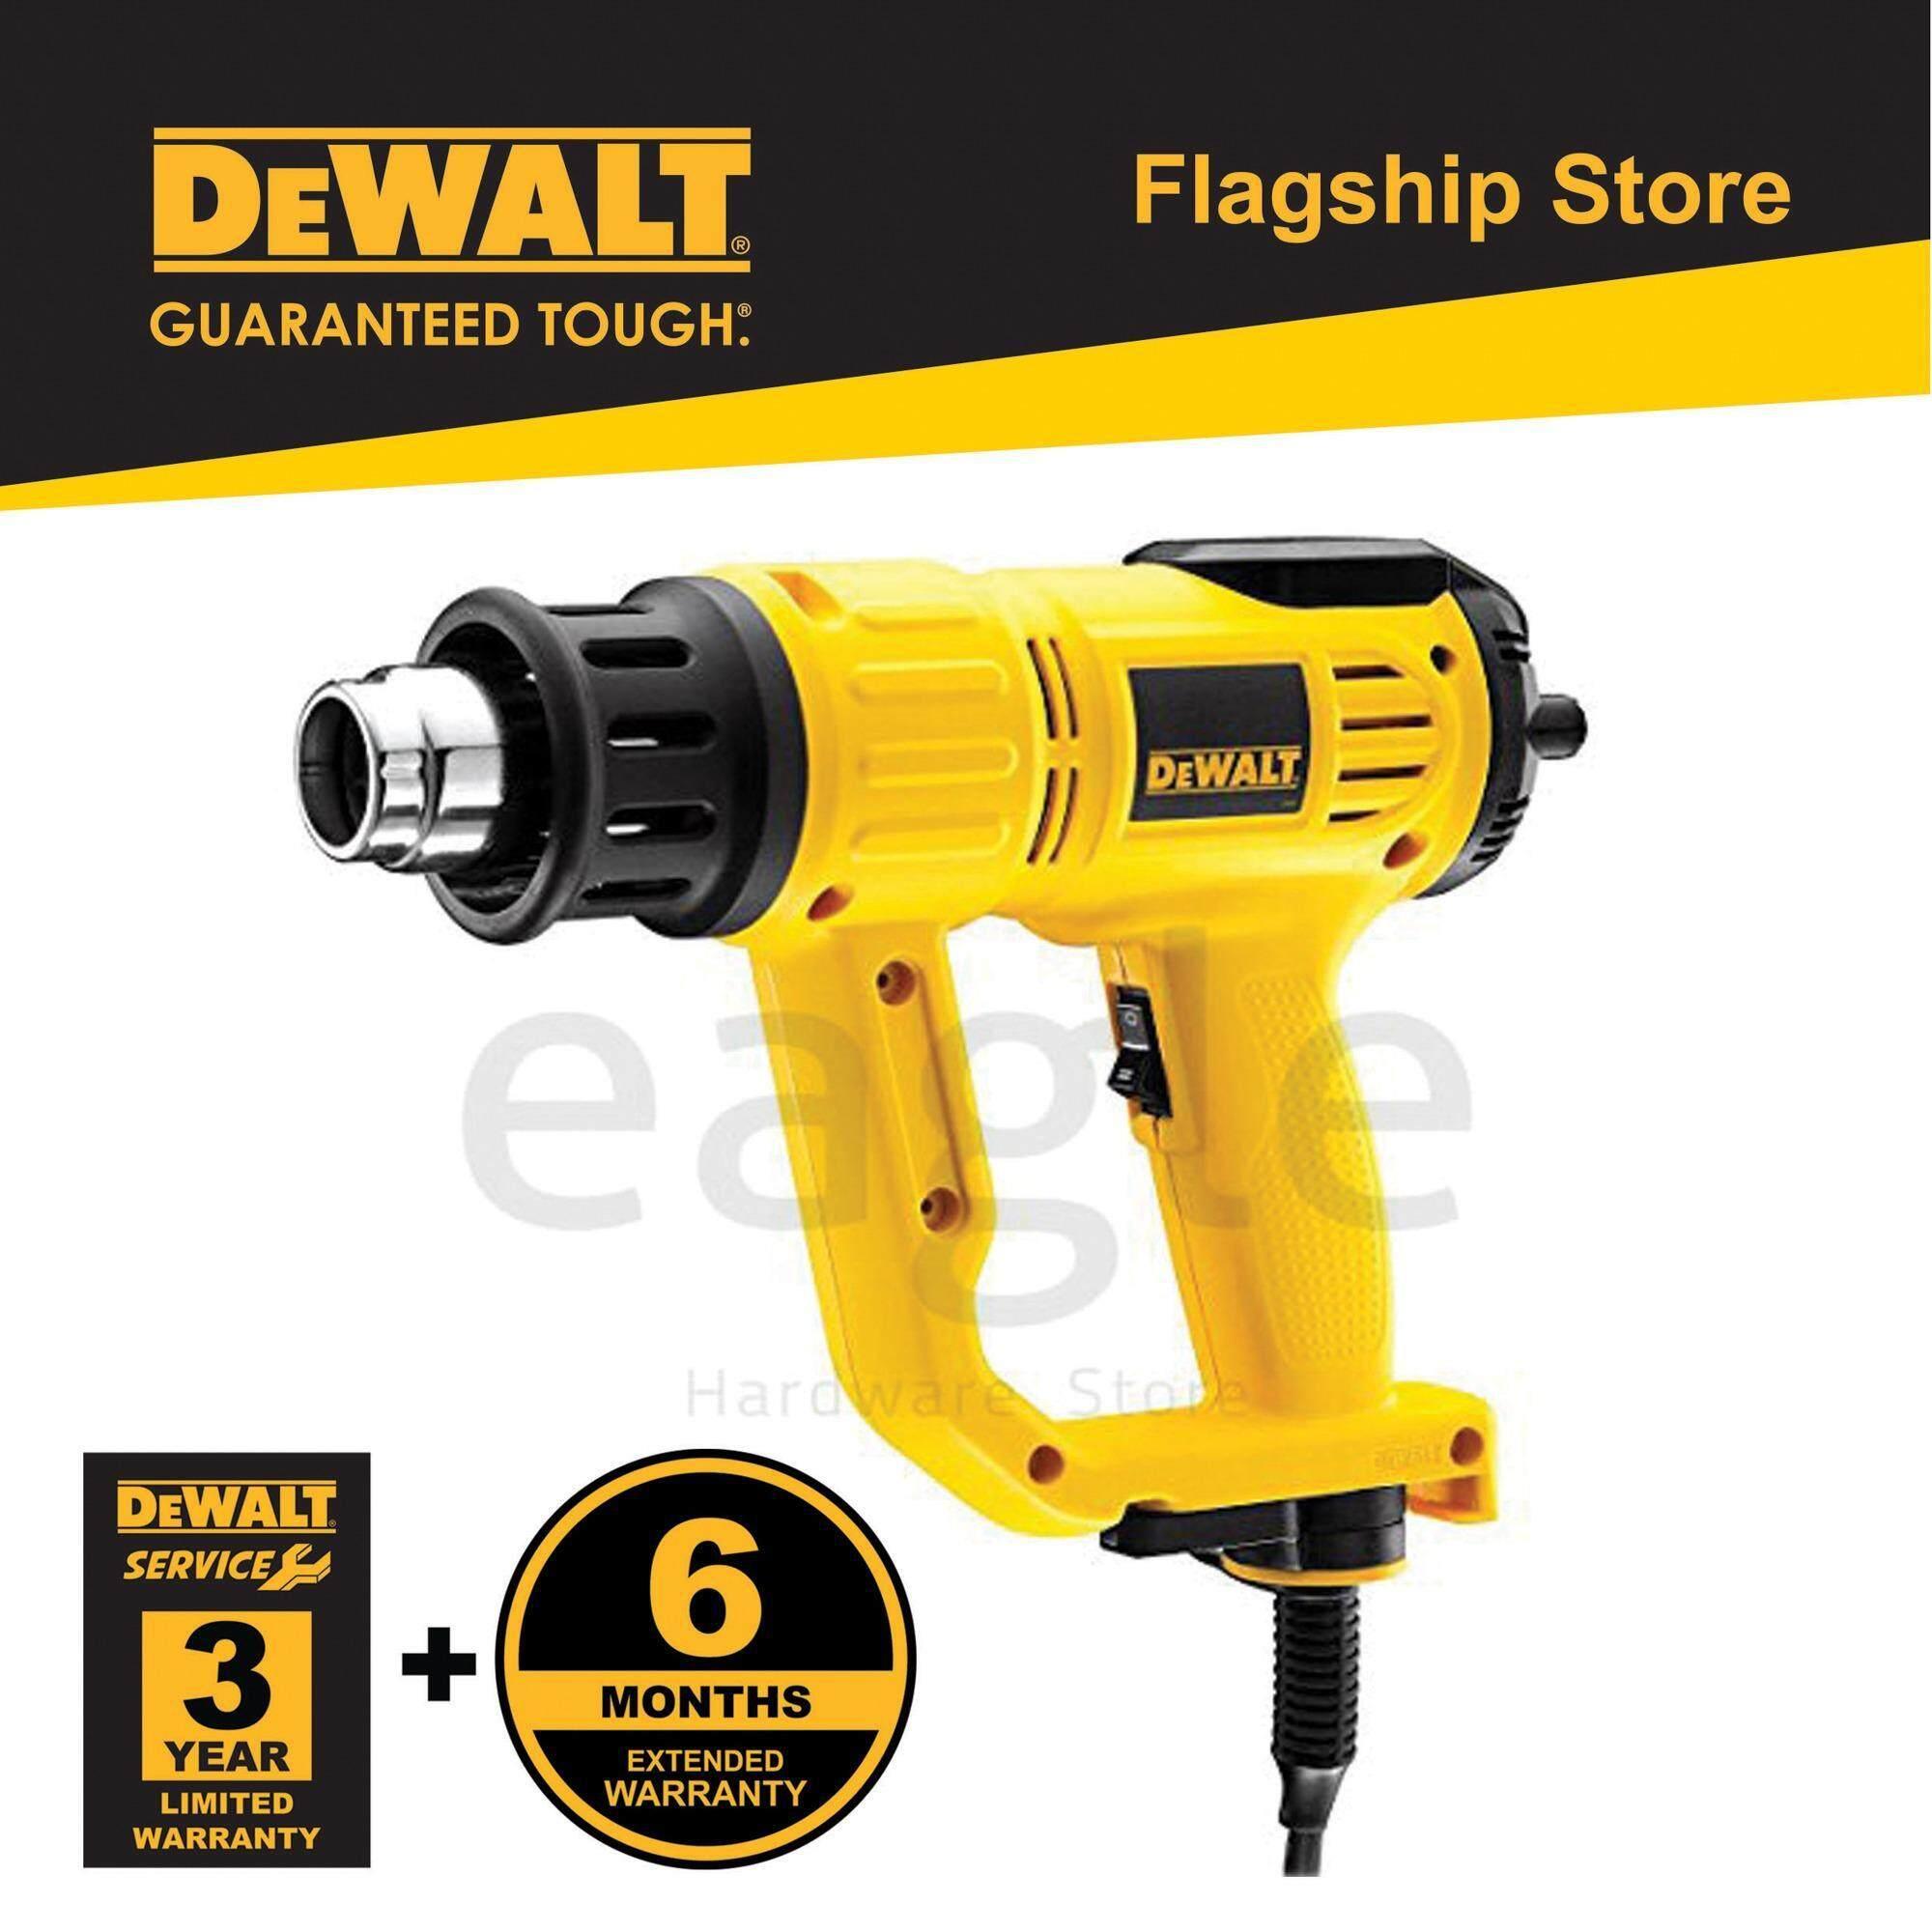 Dewalt Buy At Best Price In Malaysia Stanley 18v Brushless Impact Driver D26414 B1 2000w 50 630c Digital Heat Gun With 2pcs Standard